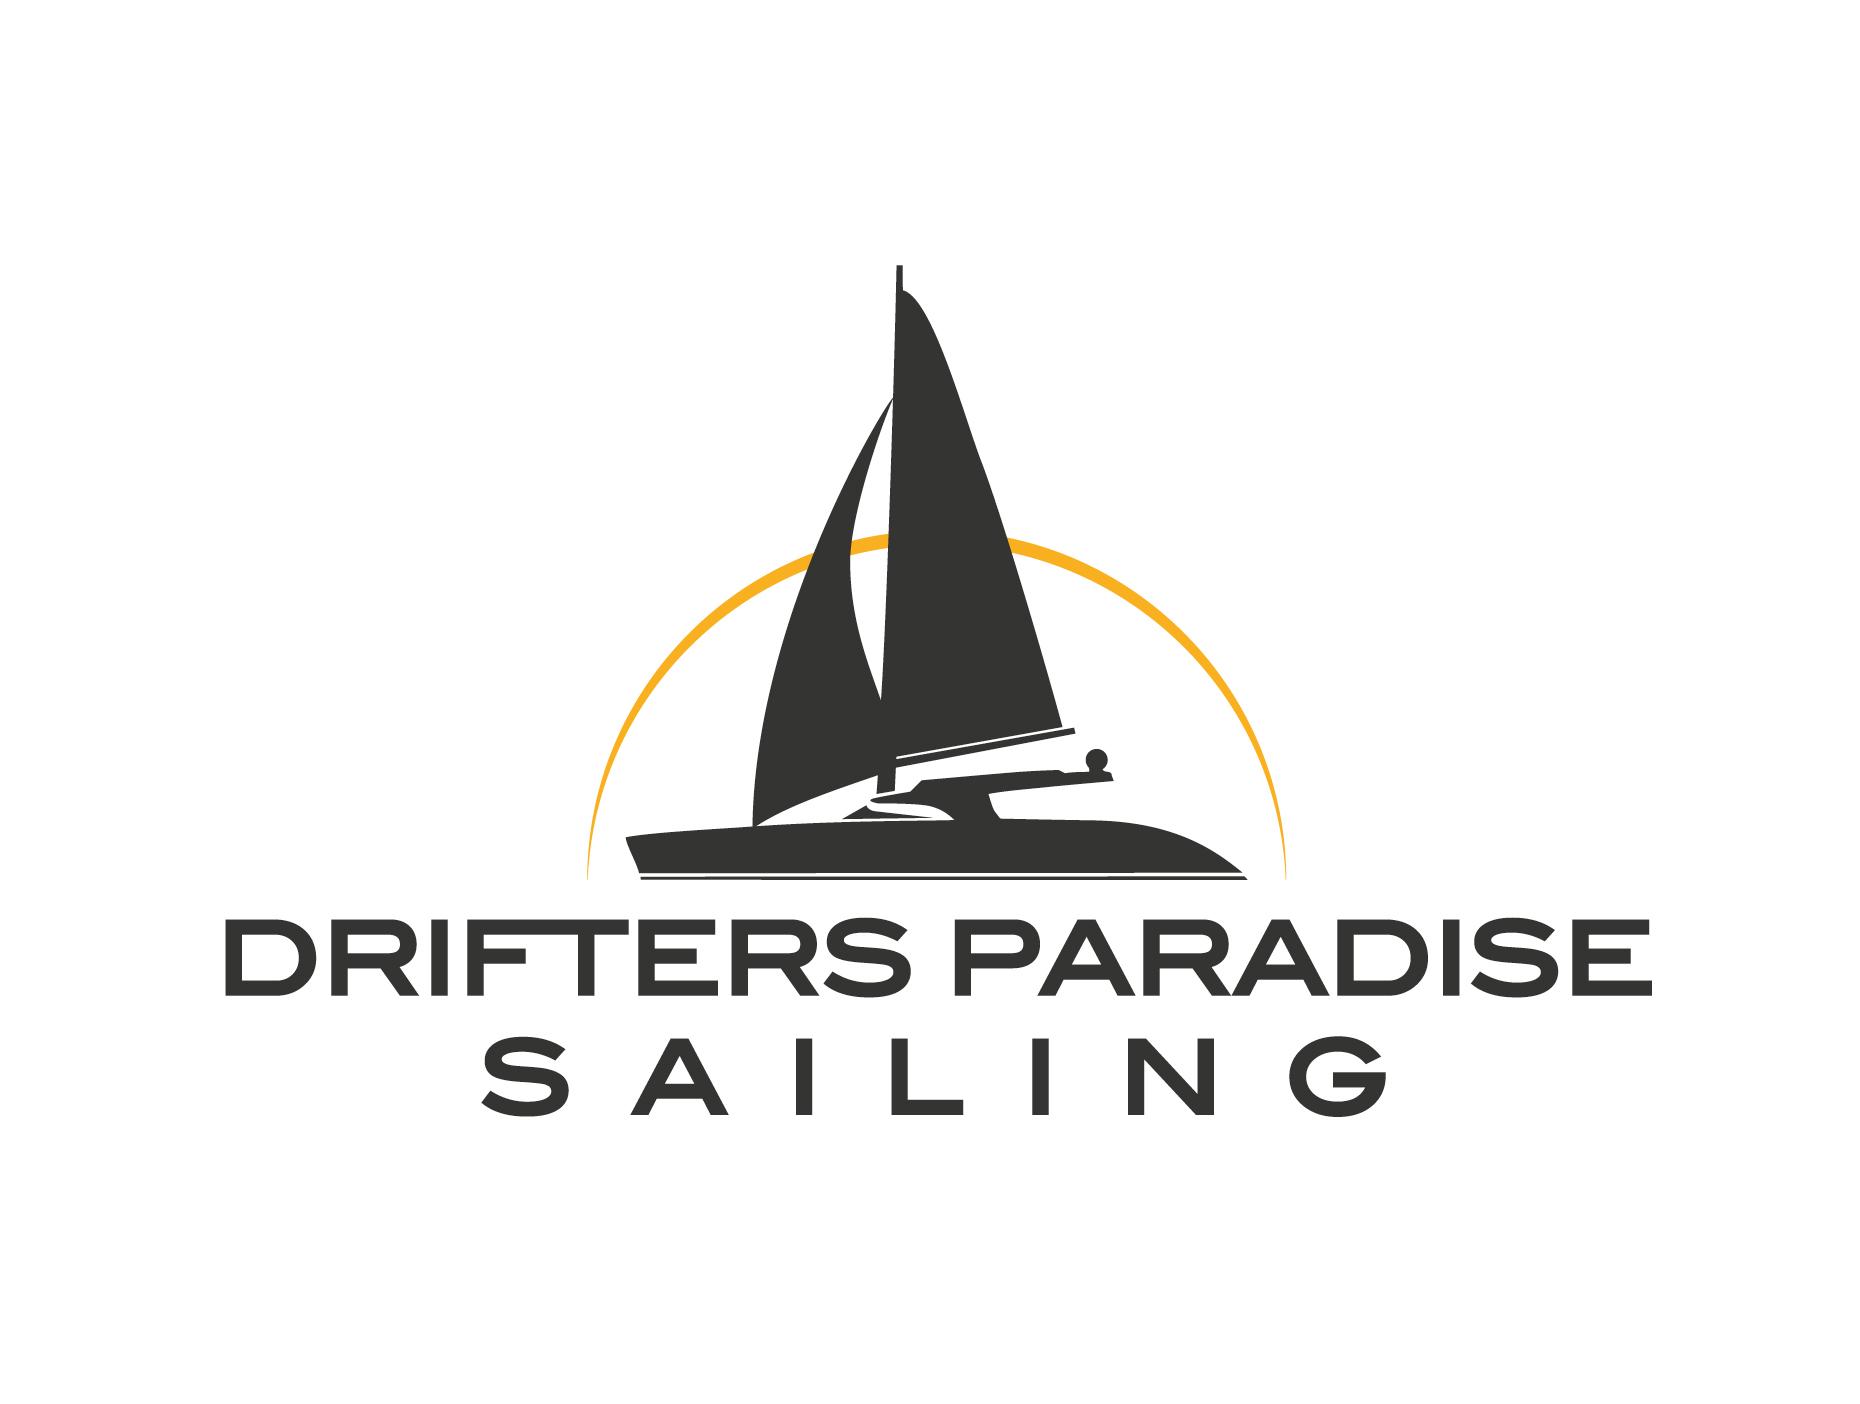 http://www.scancharter.com/wp-content/uploads/boats/14834_drifters_paradise_sailing_logo.jpg